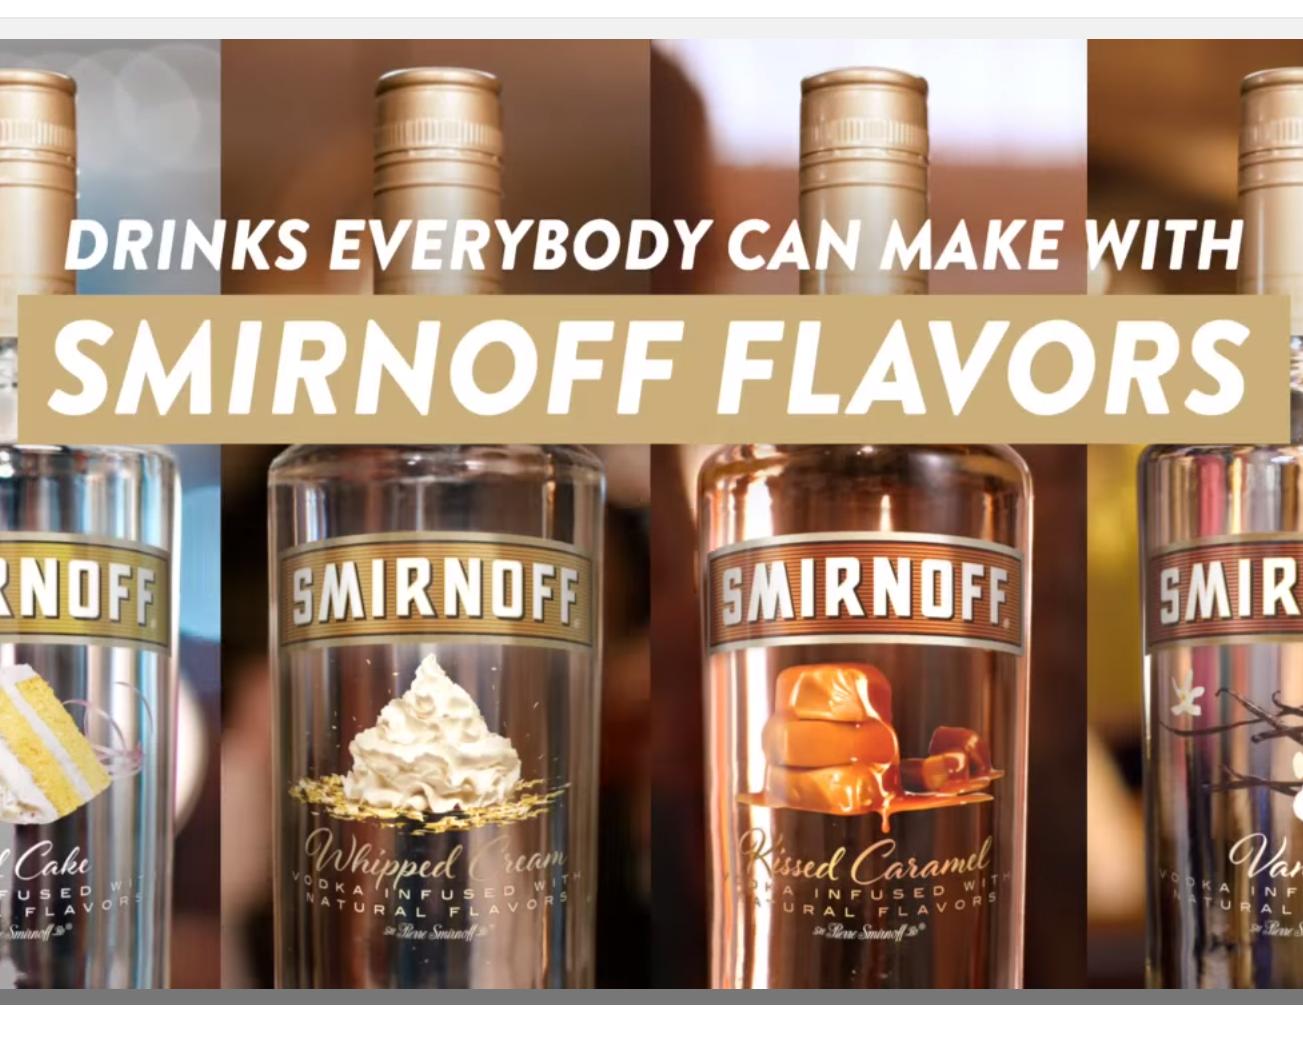 smirnoff flavors video